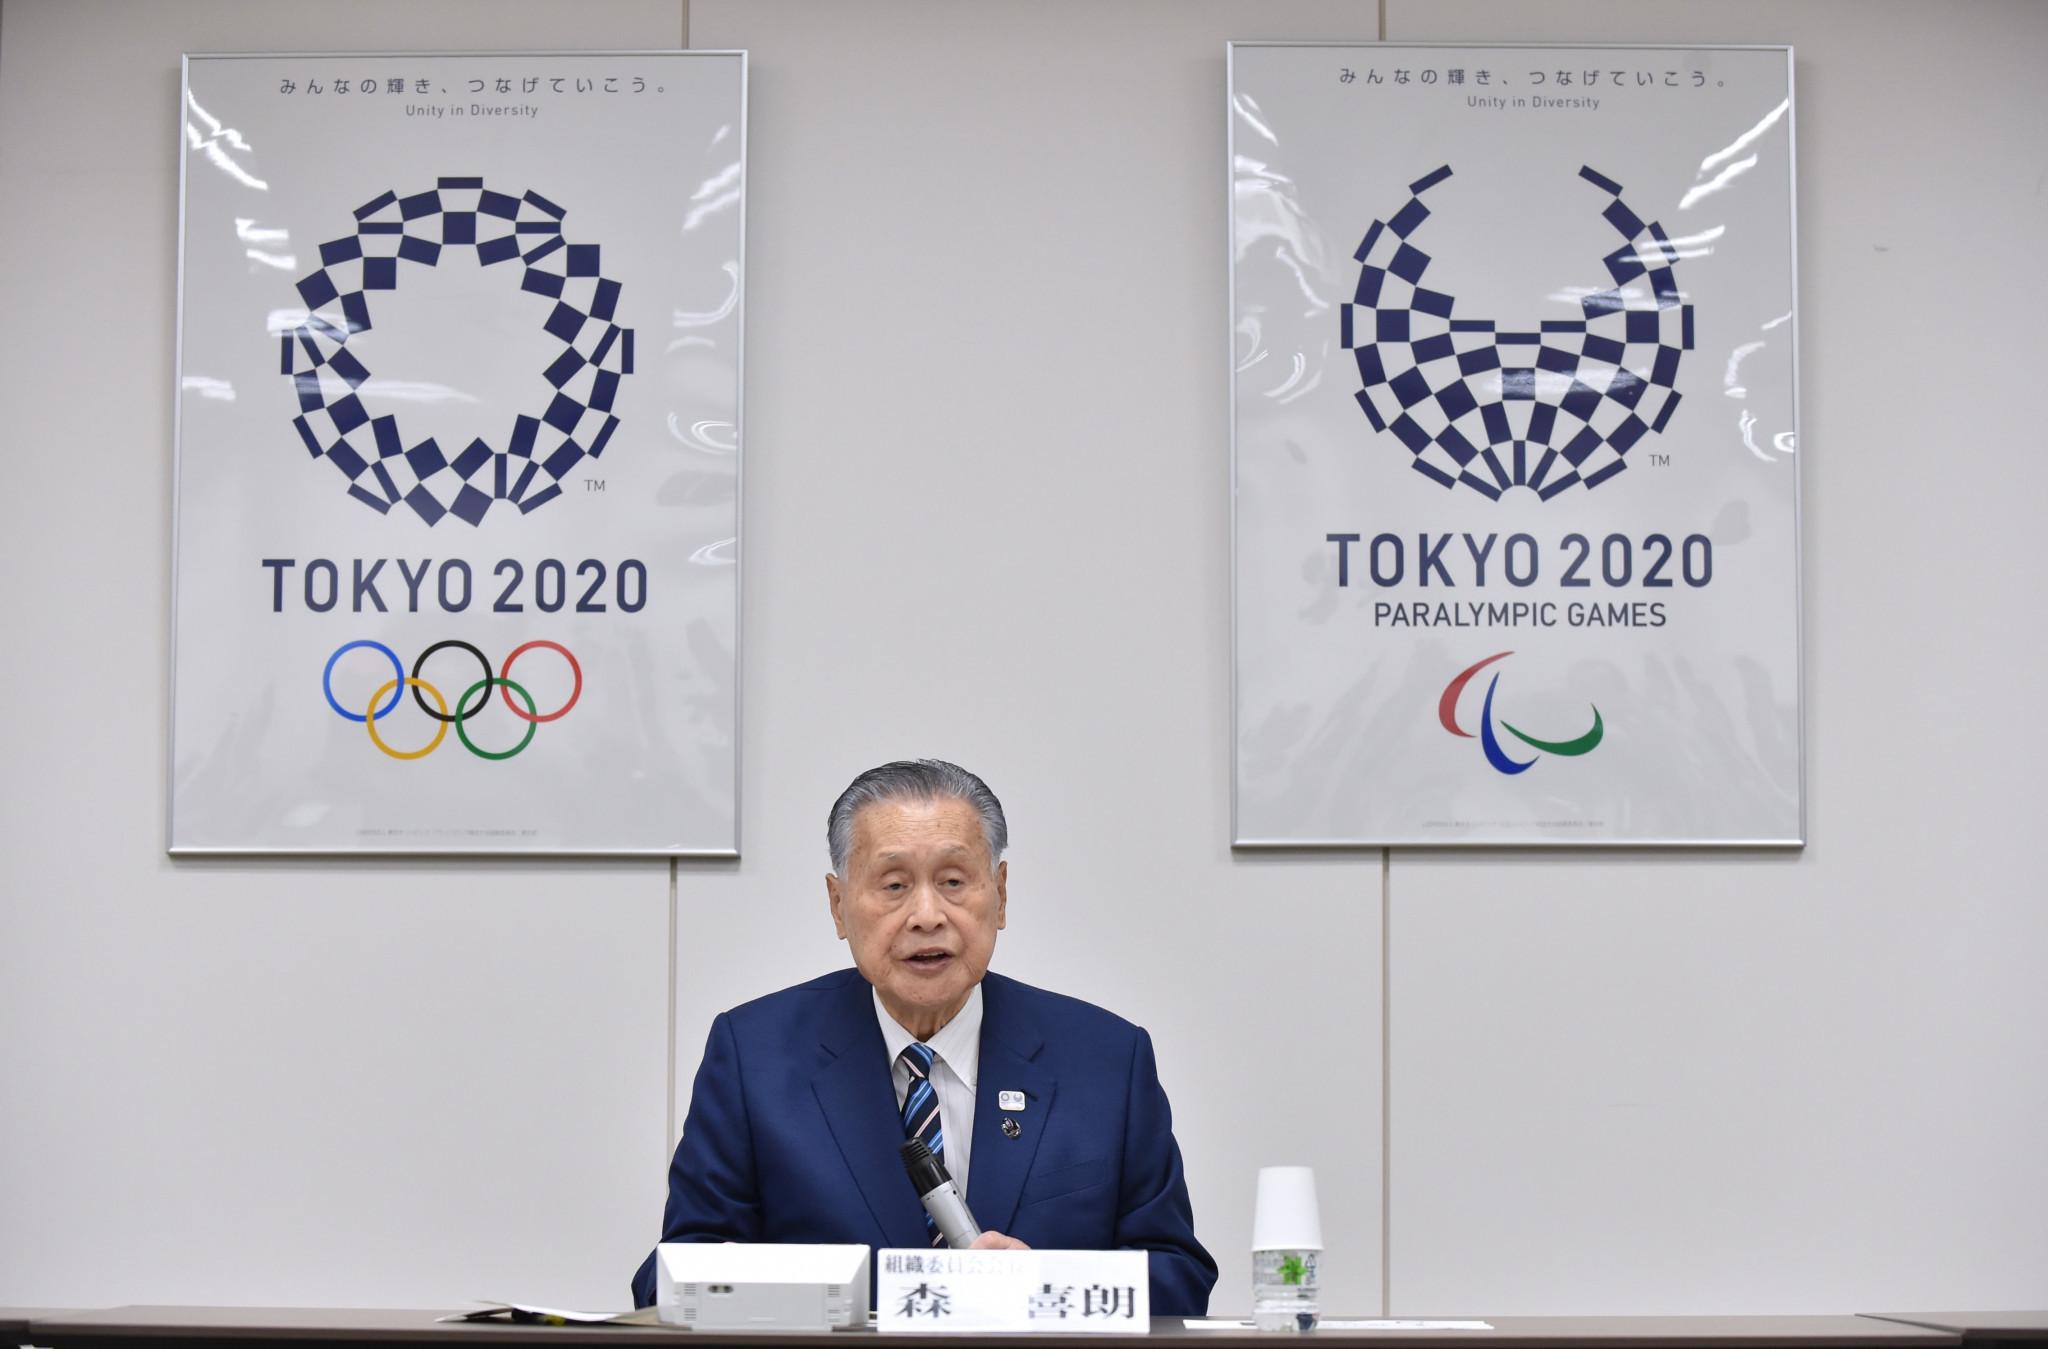 Tokyo 2020 President Yoshiro Mori announced the news today ©Getty Images